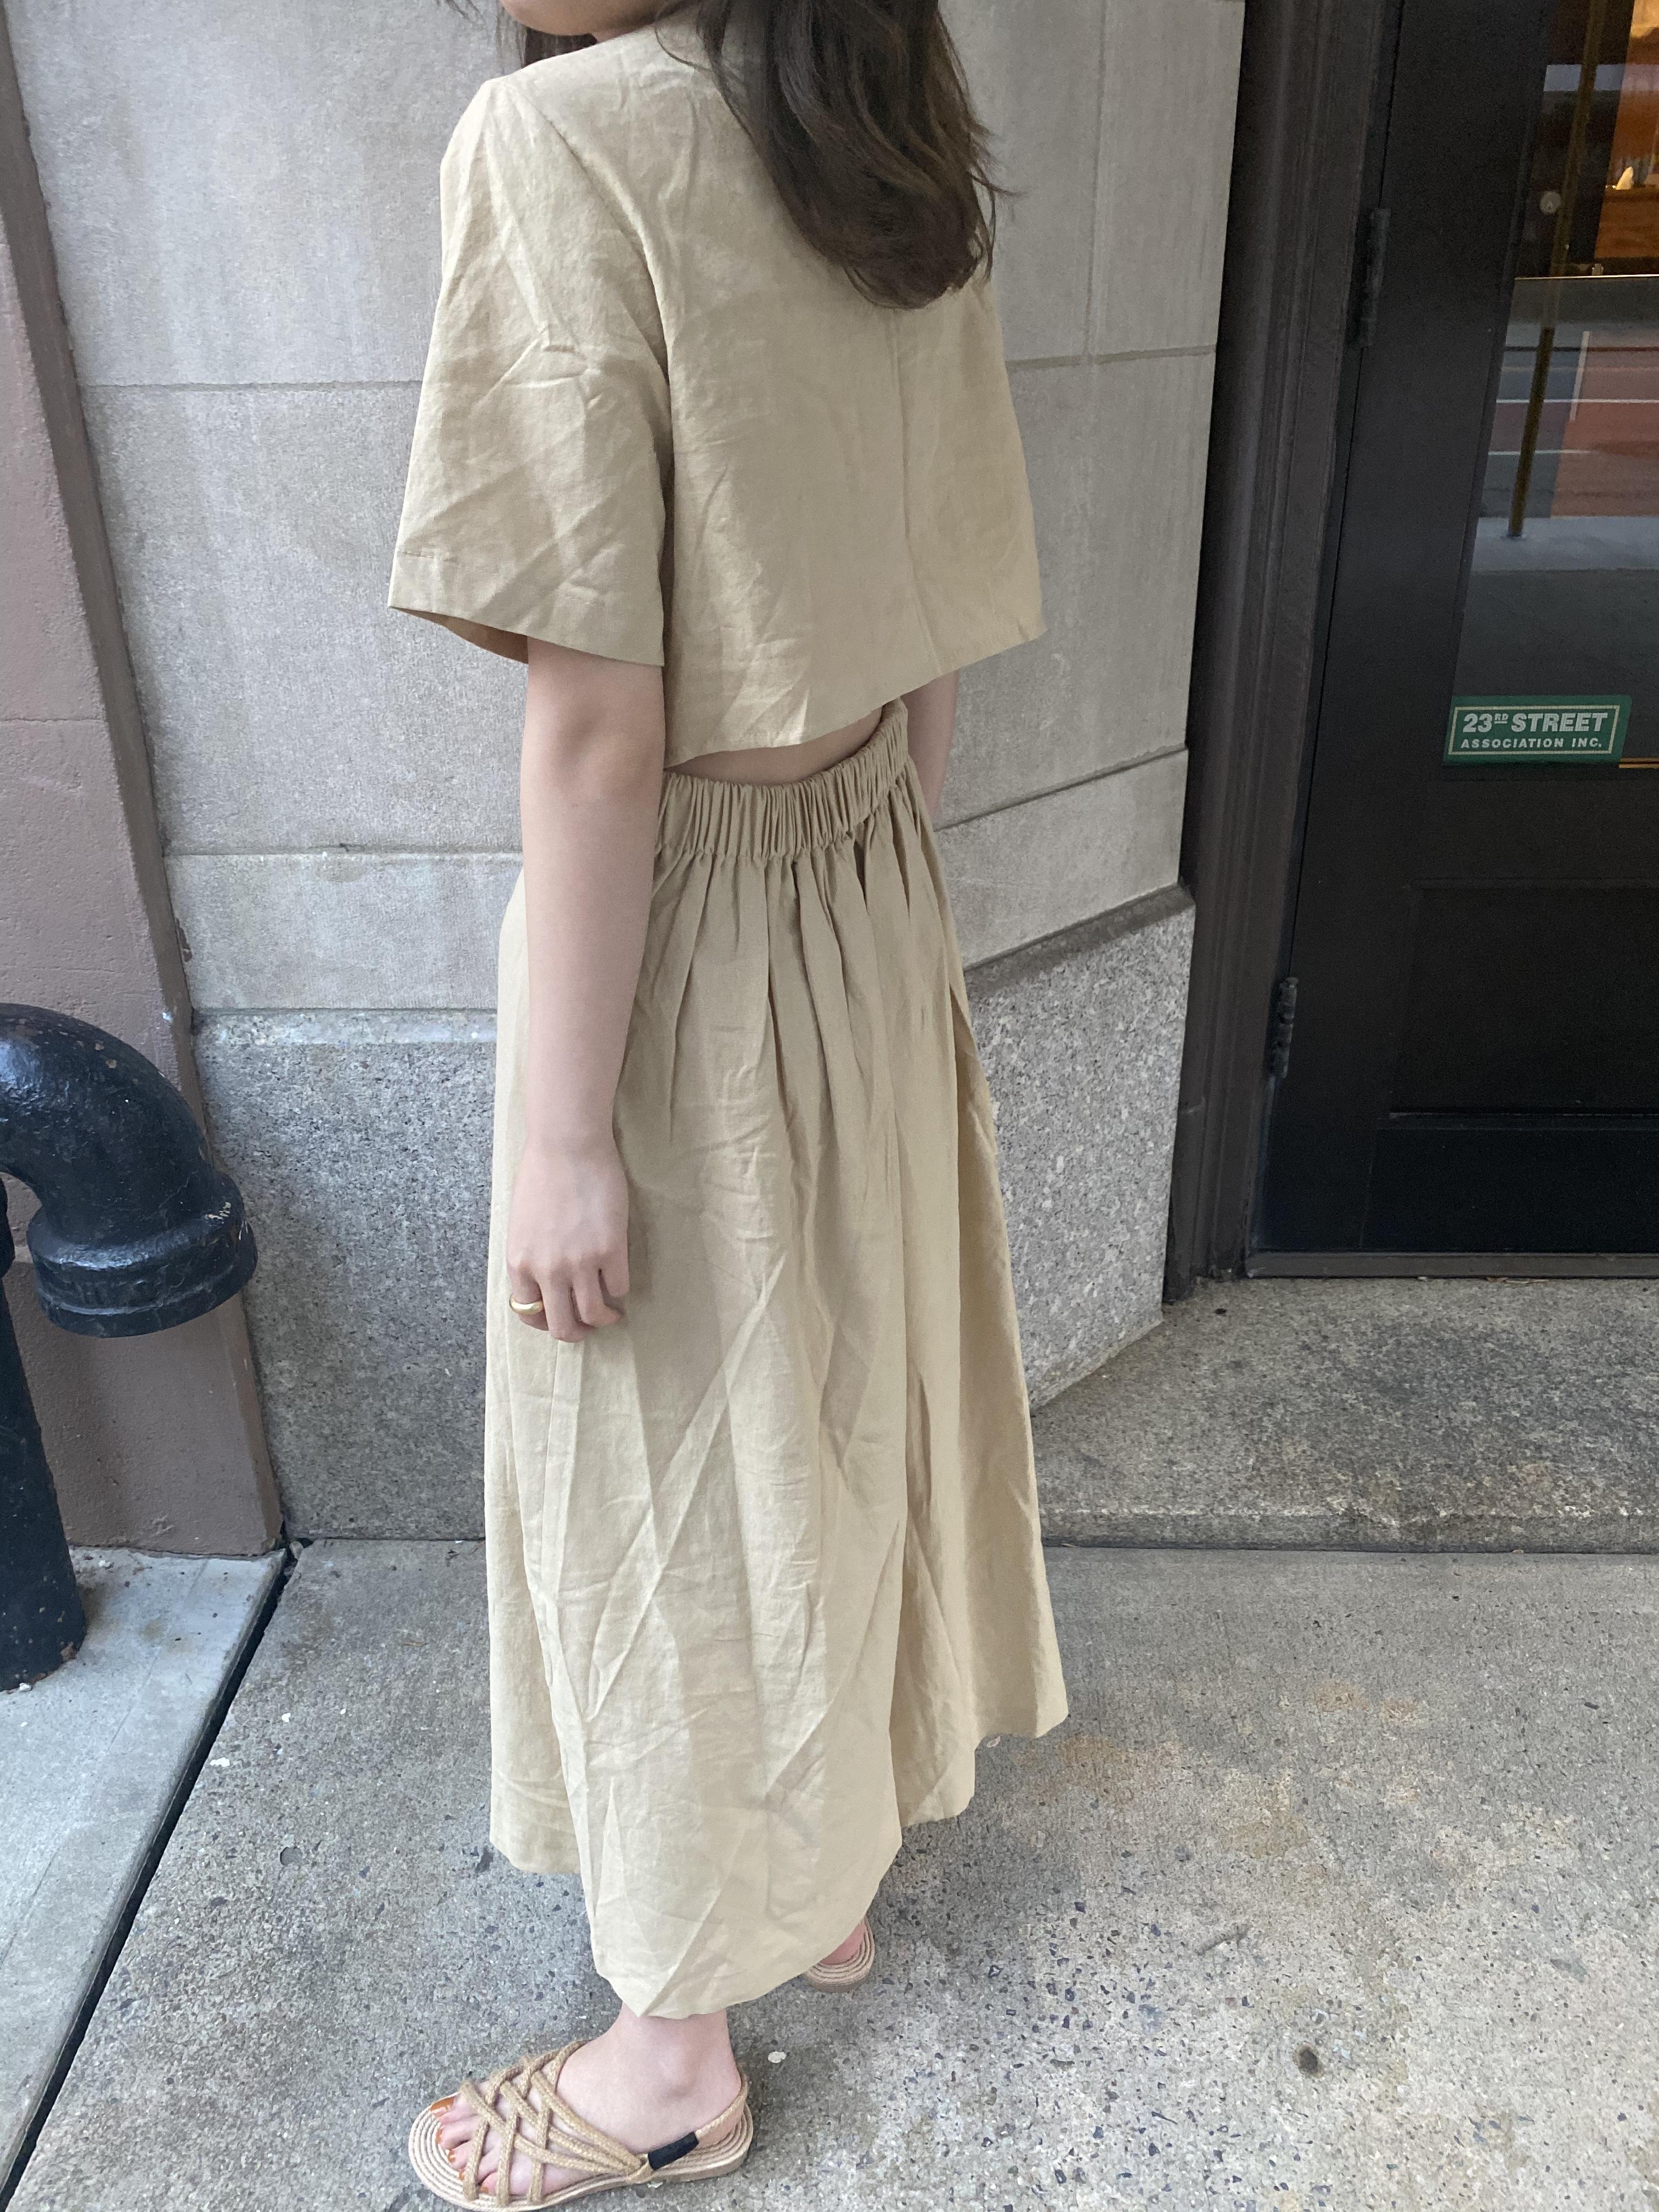 DAYNYC Backcut dress